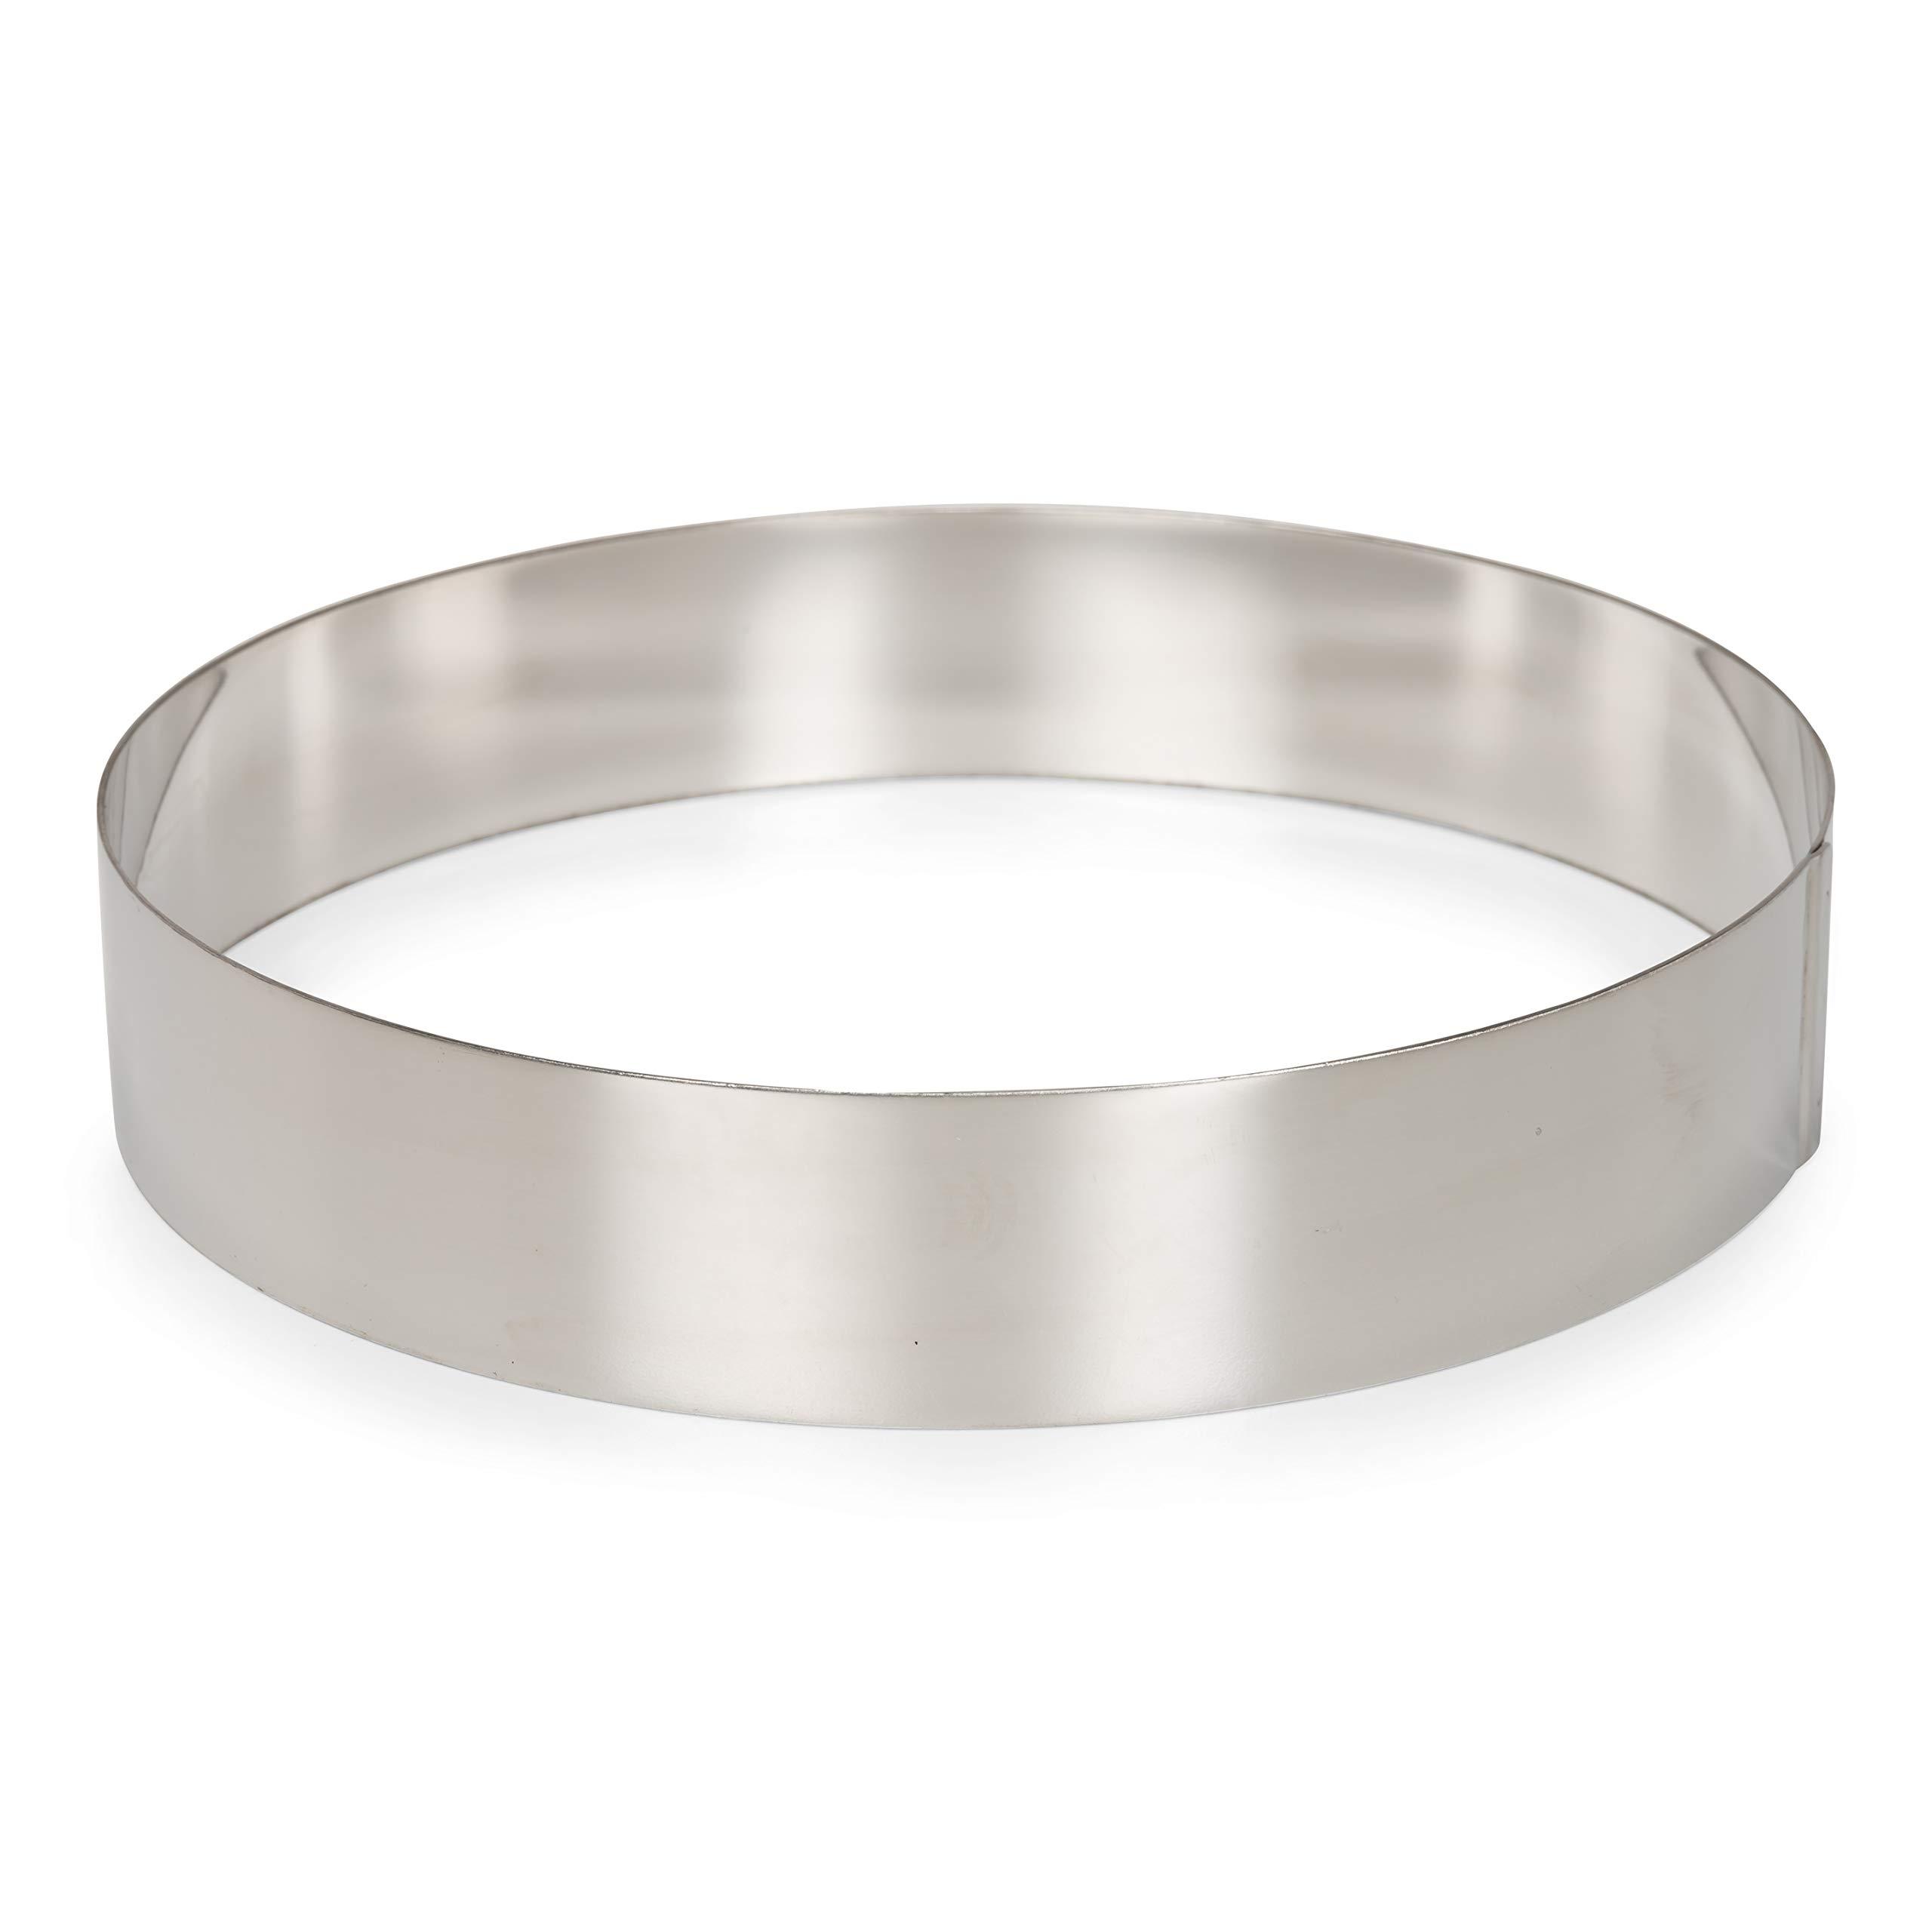 Patisse 02158 Round Cake Ring, 10-1/4'' (26 cm) Stainless Steel